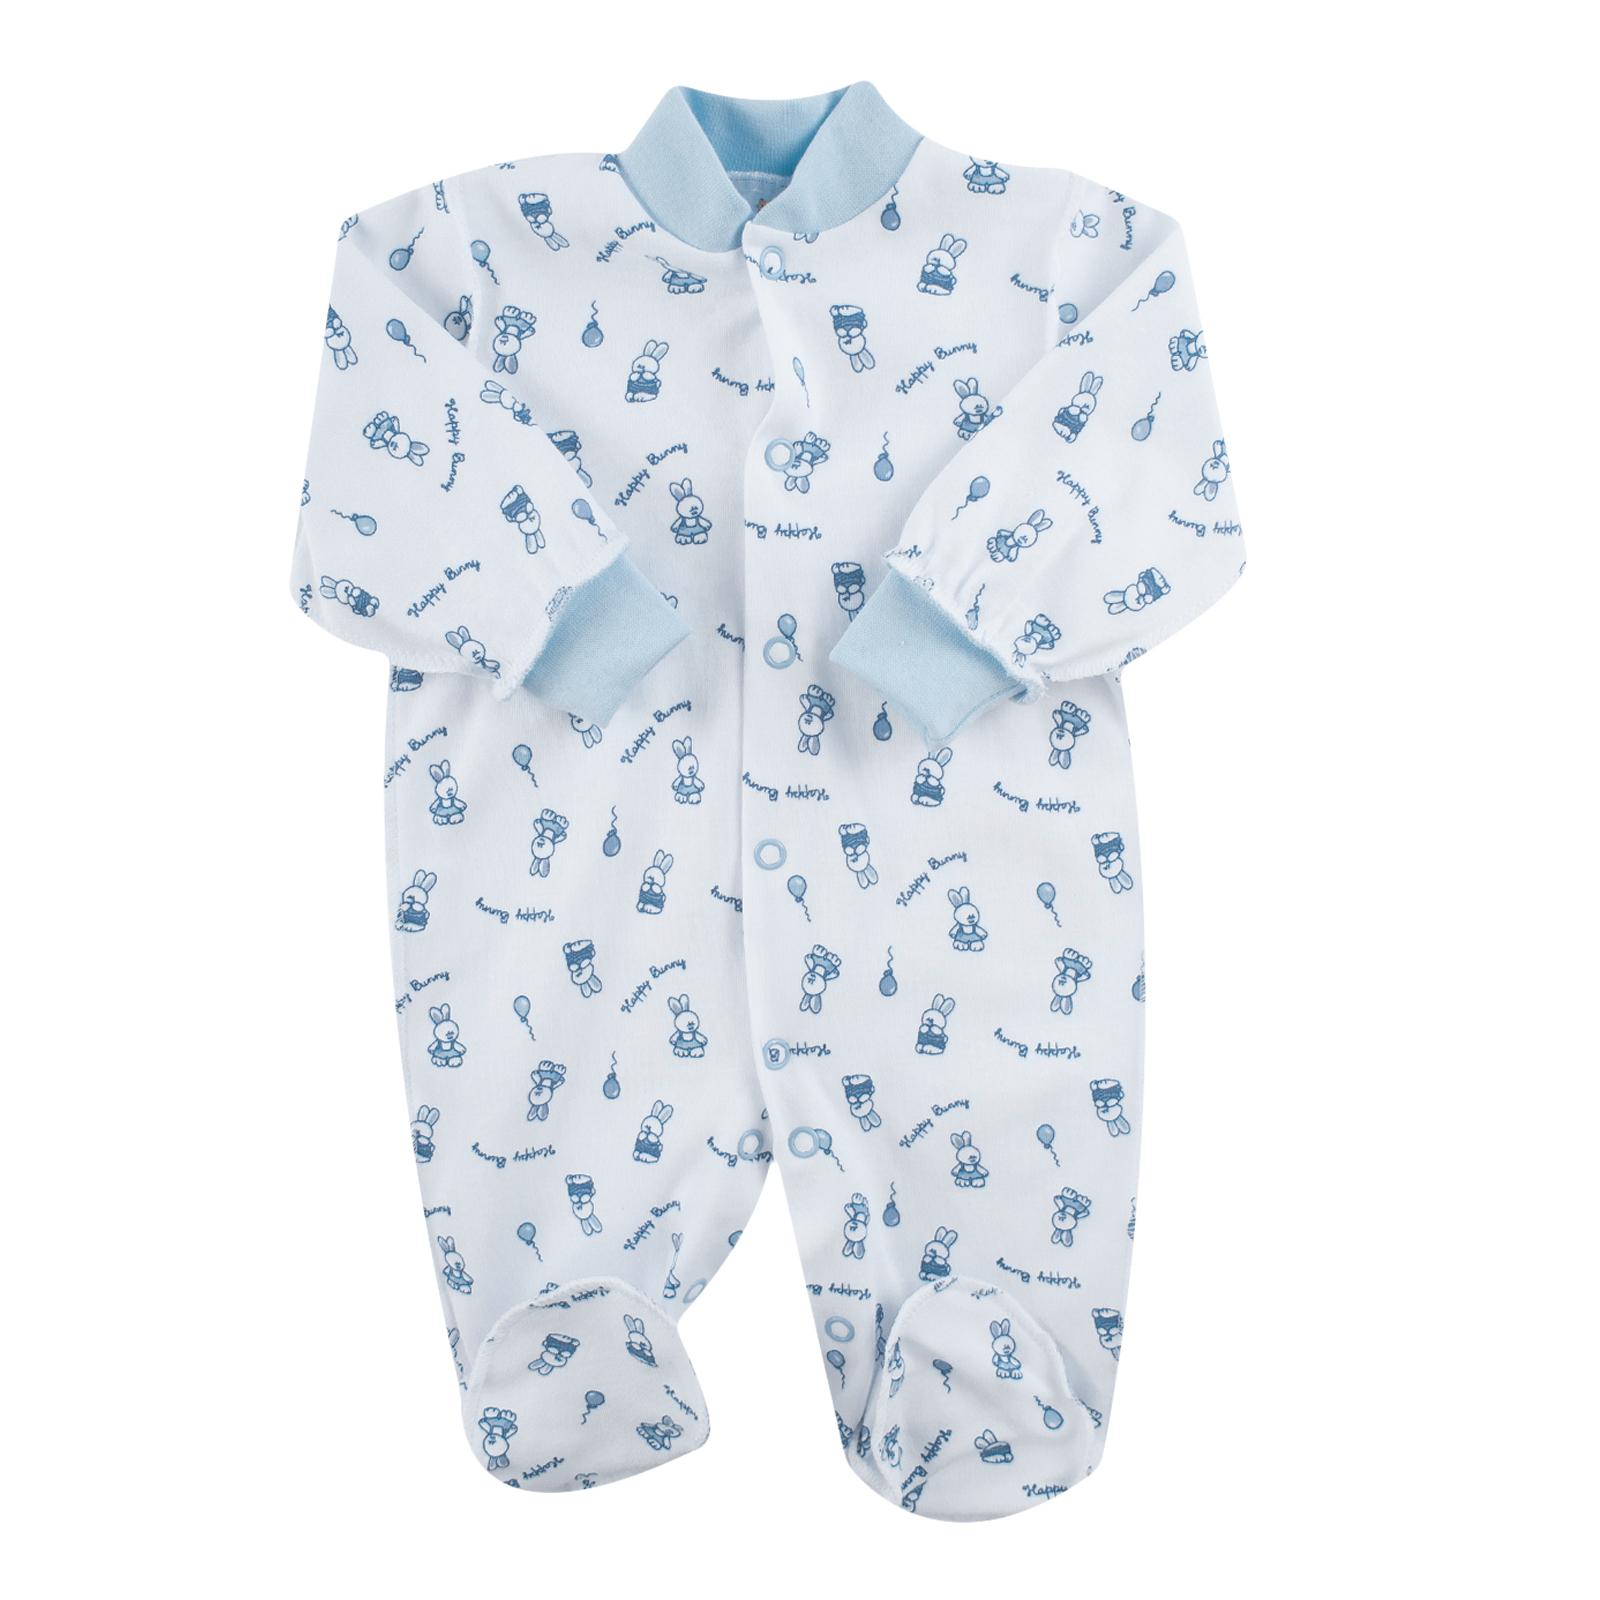 Комбинезон КОТМАРКОТ для мальчика, цвет набивка голубой тон 3-6 мес (размер 68)